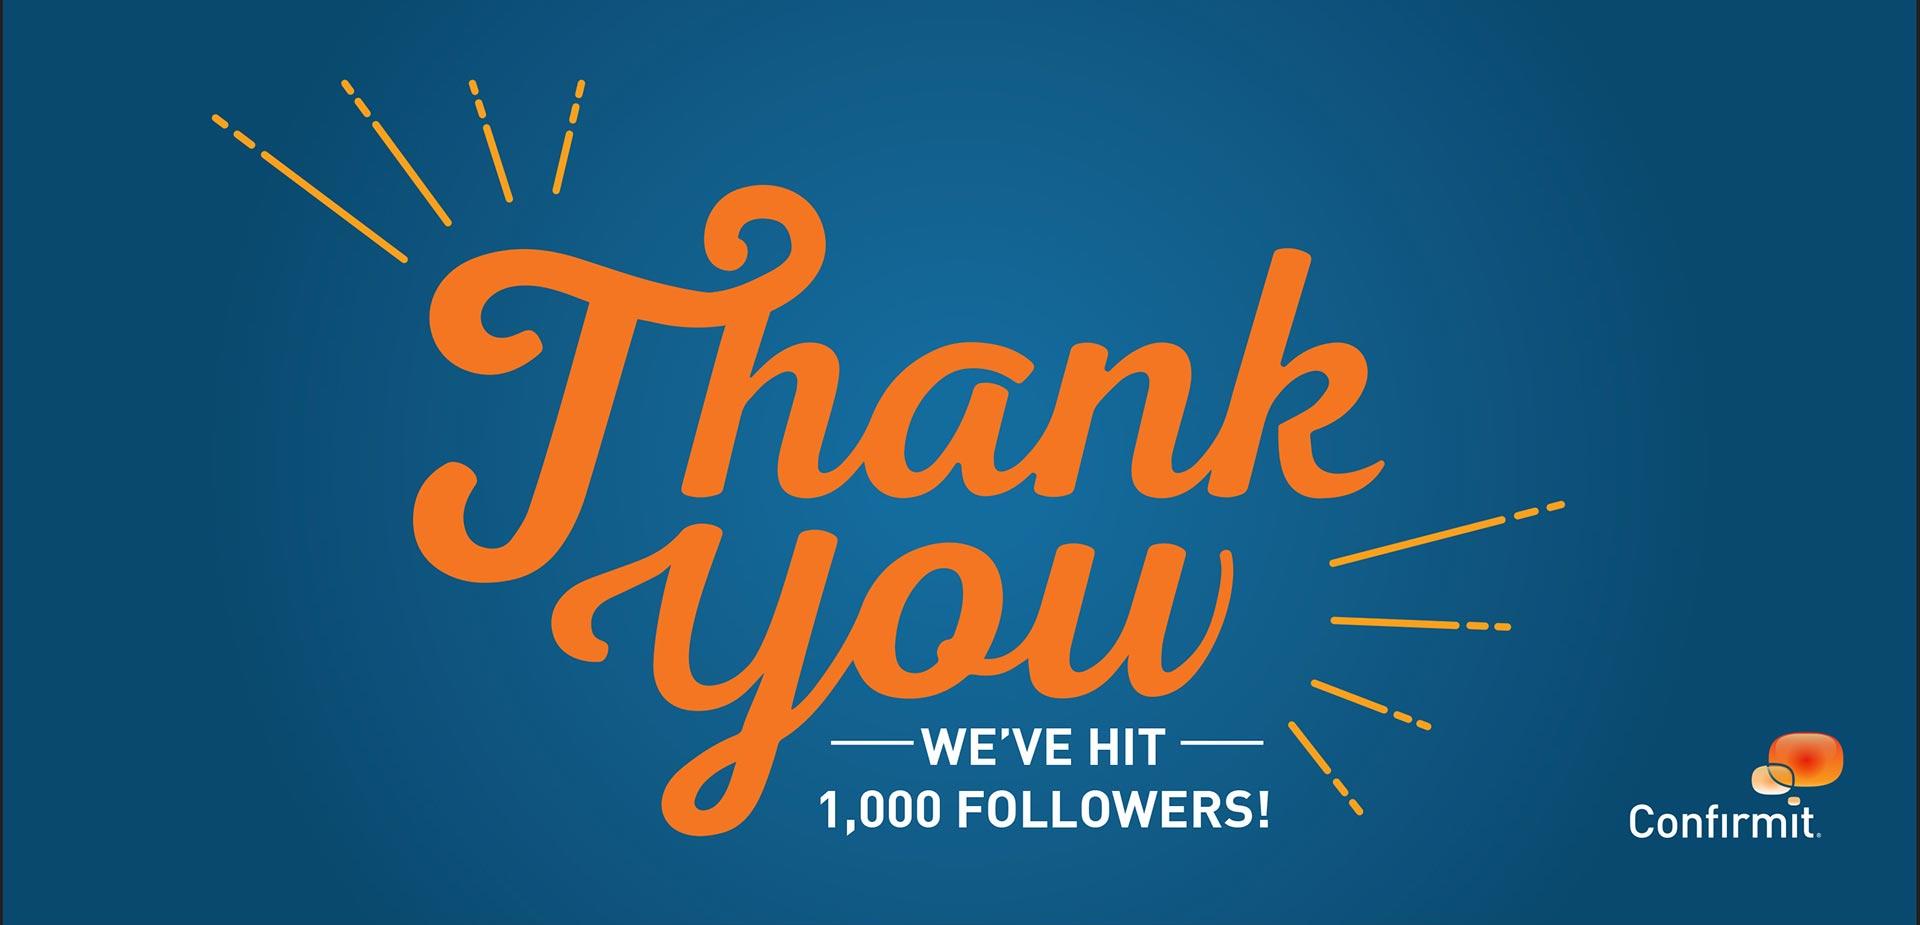 'Thank you' social media piece for 1,000 followers.